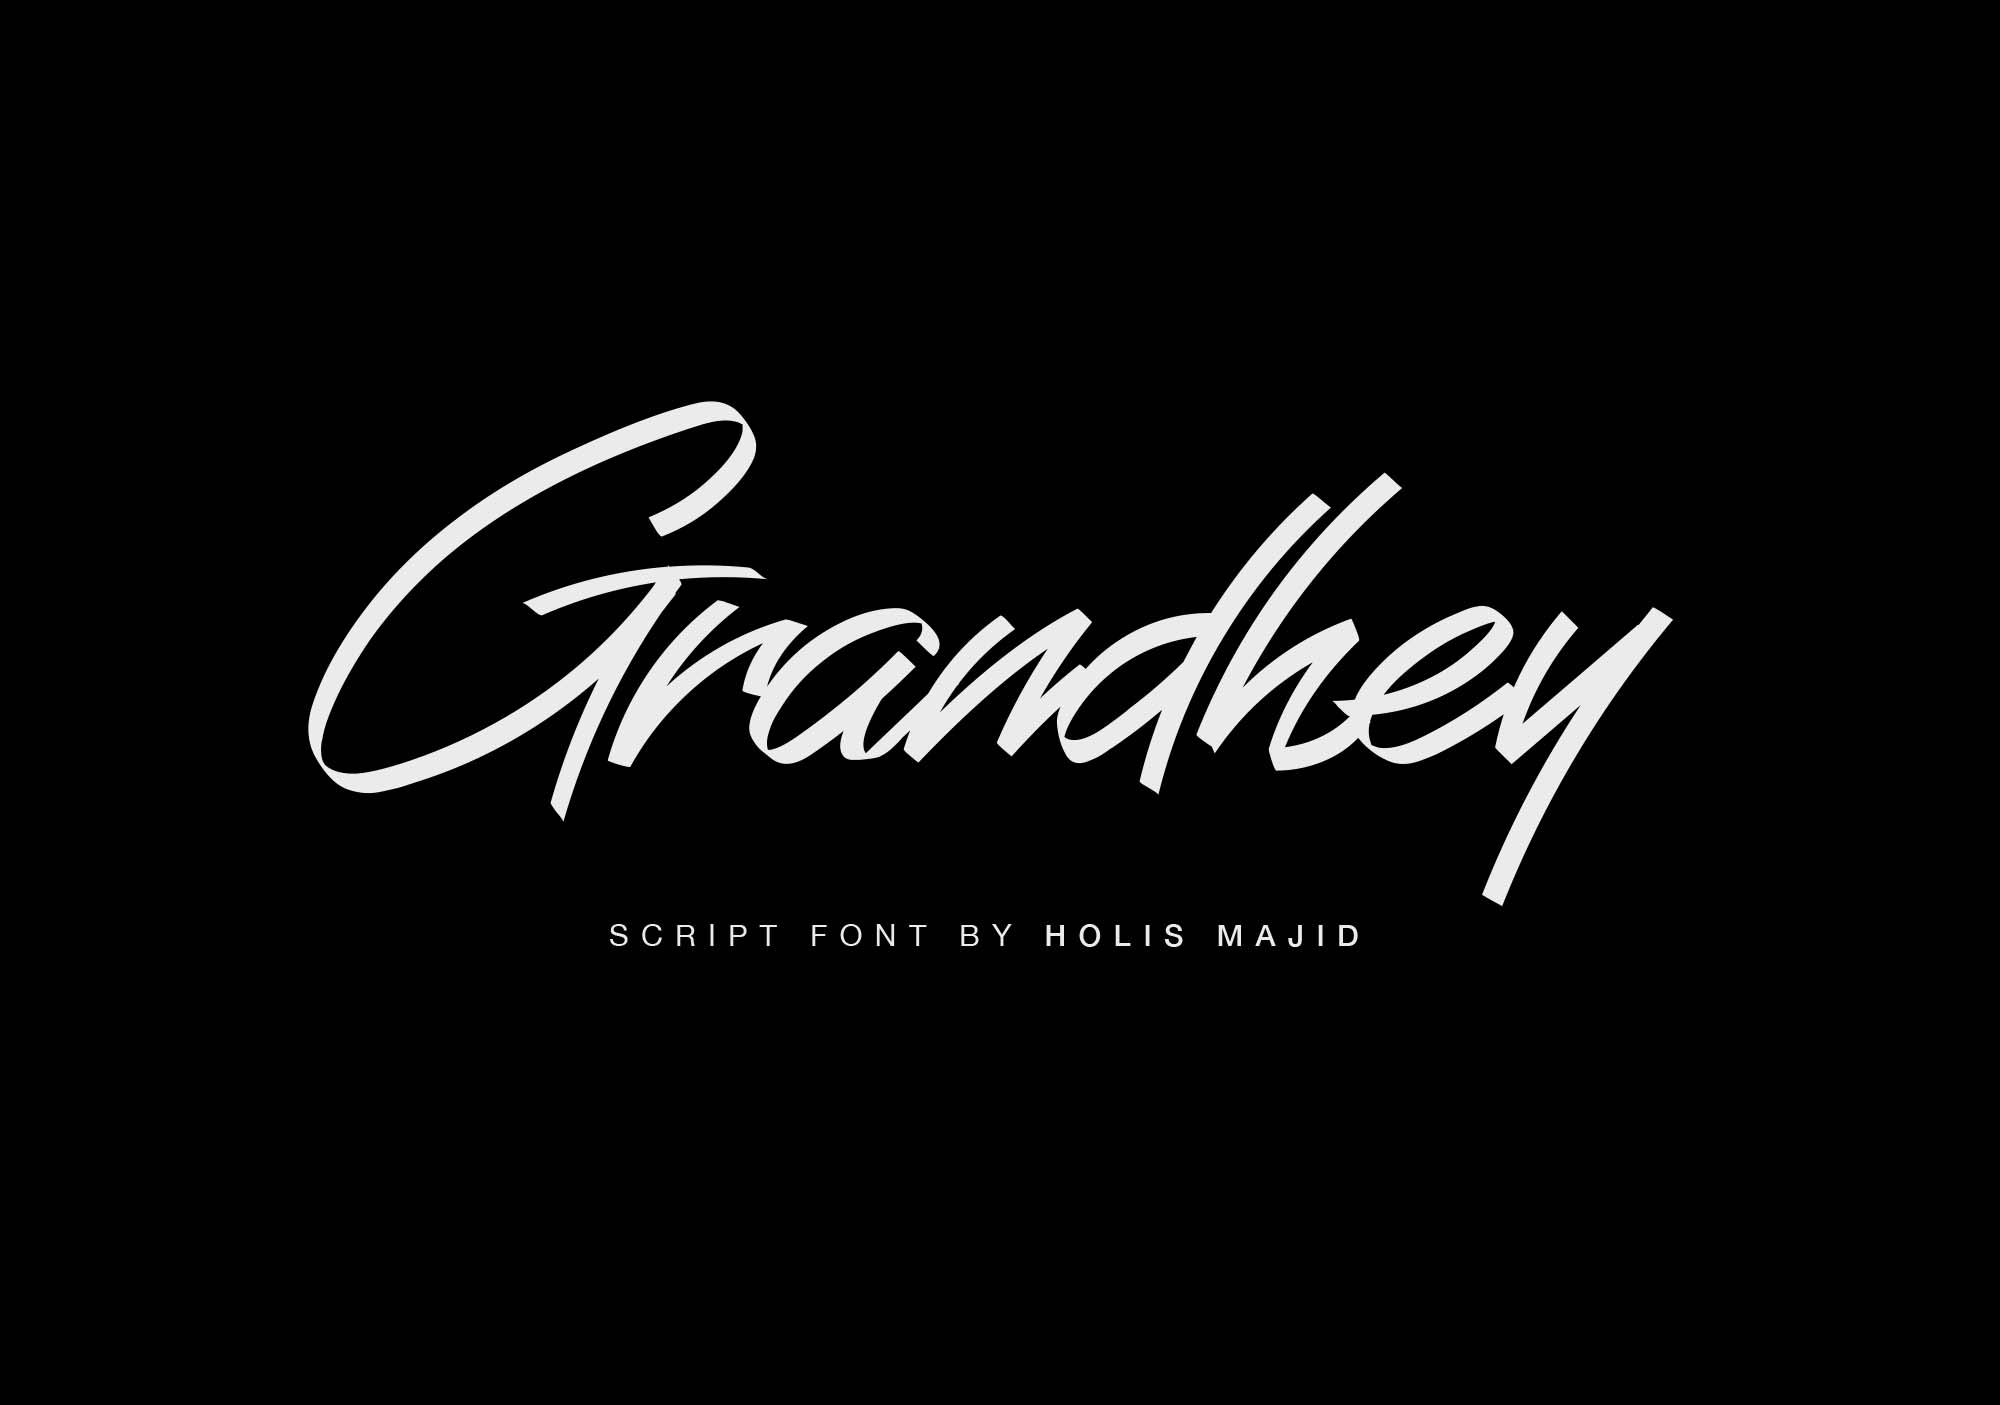 Grandhey Font